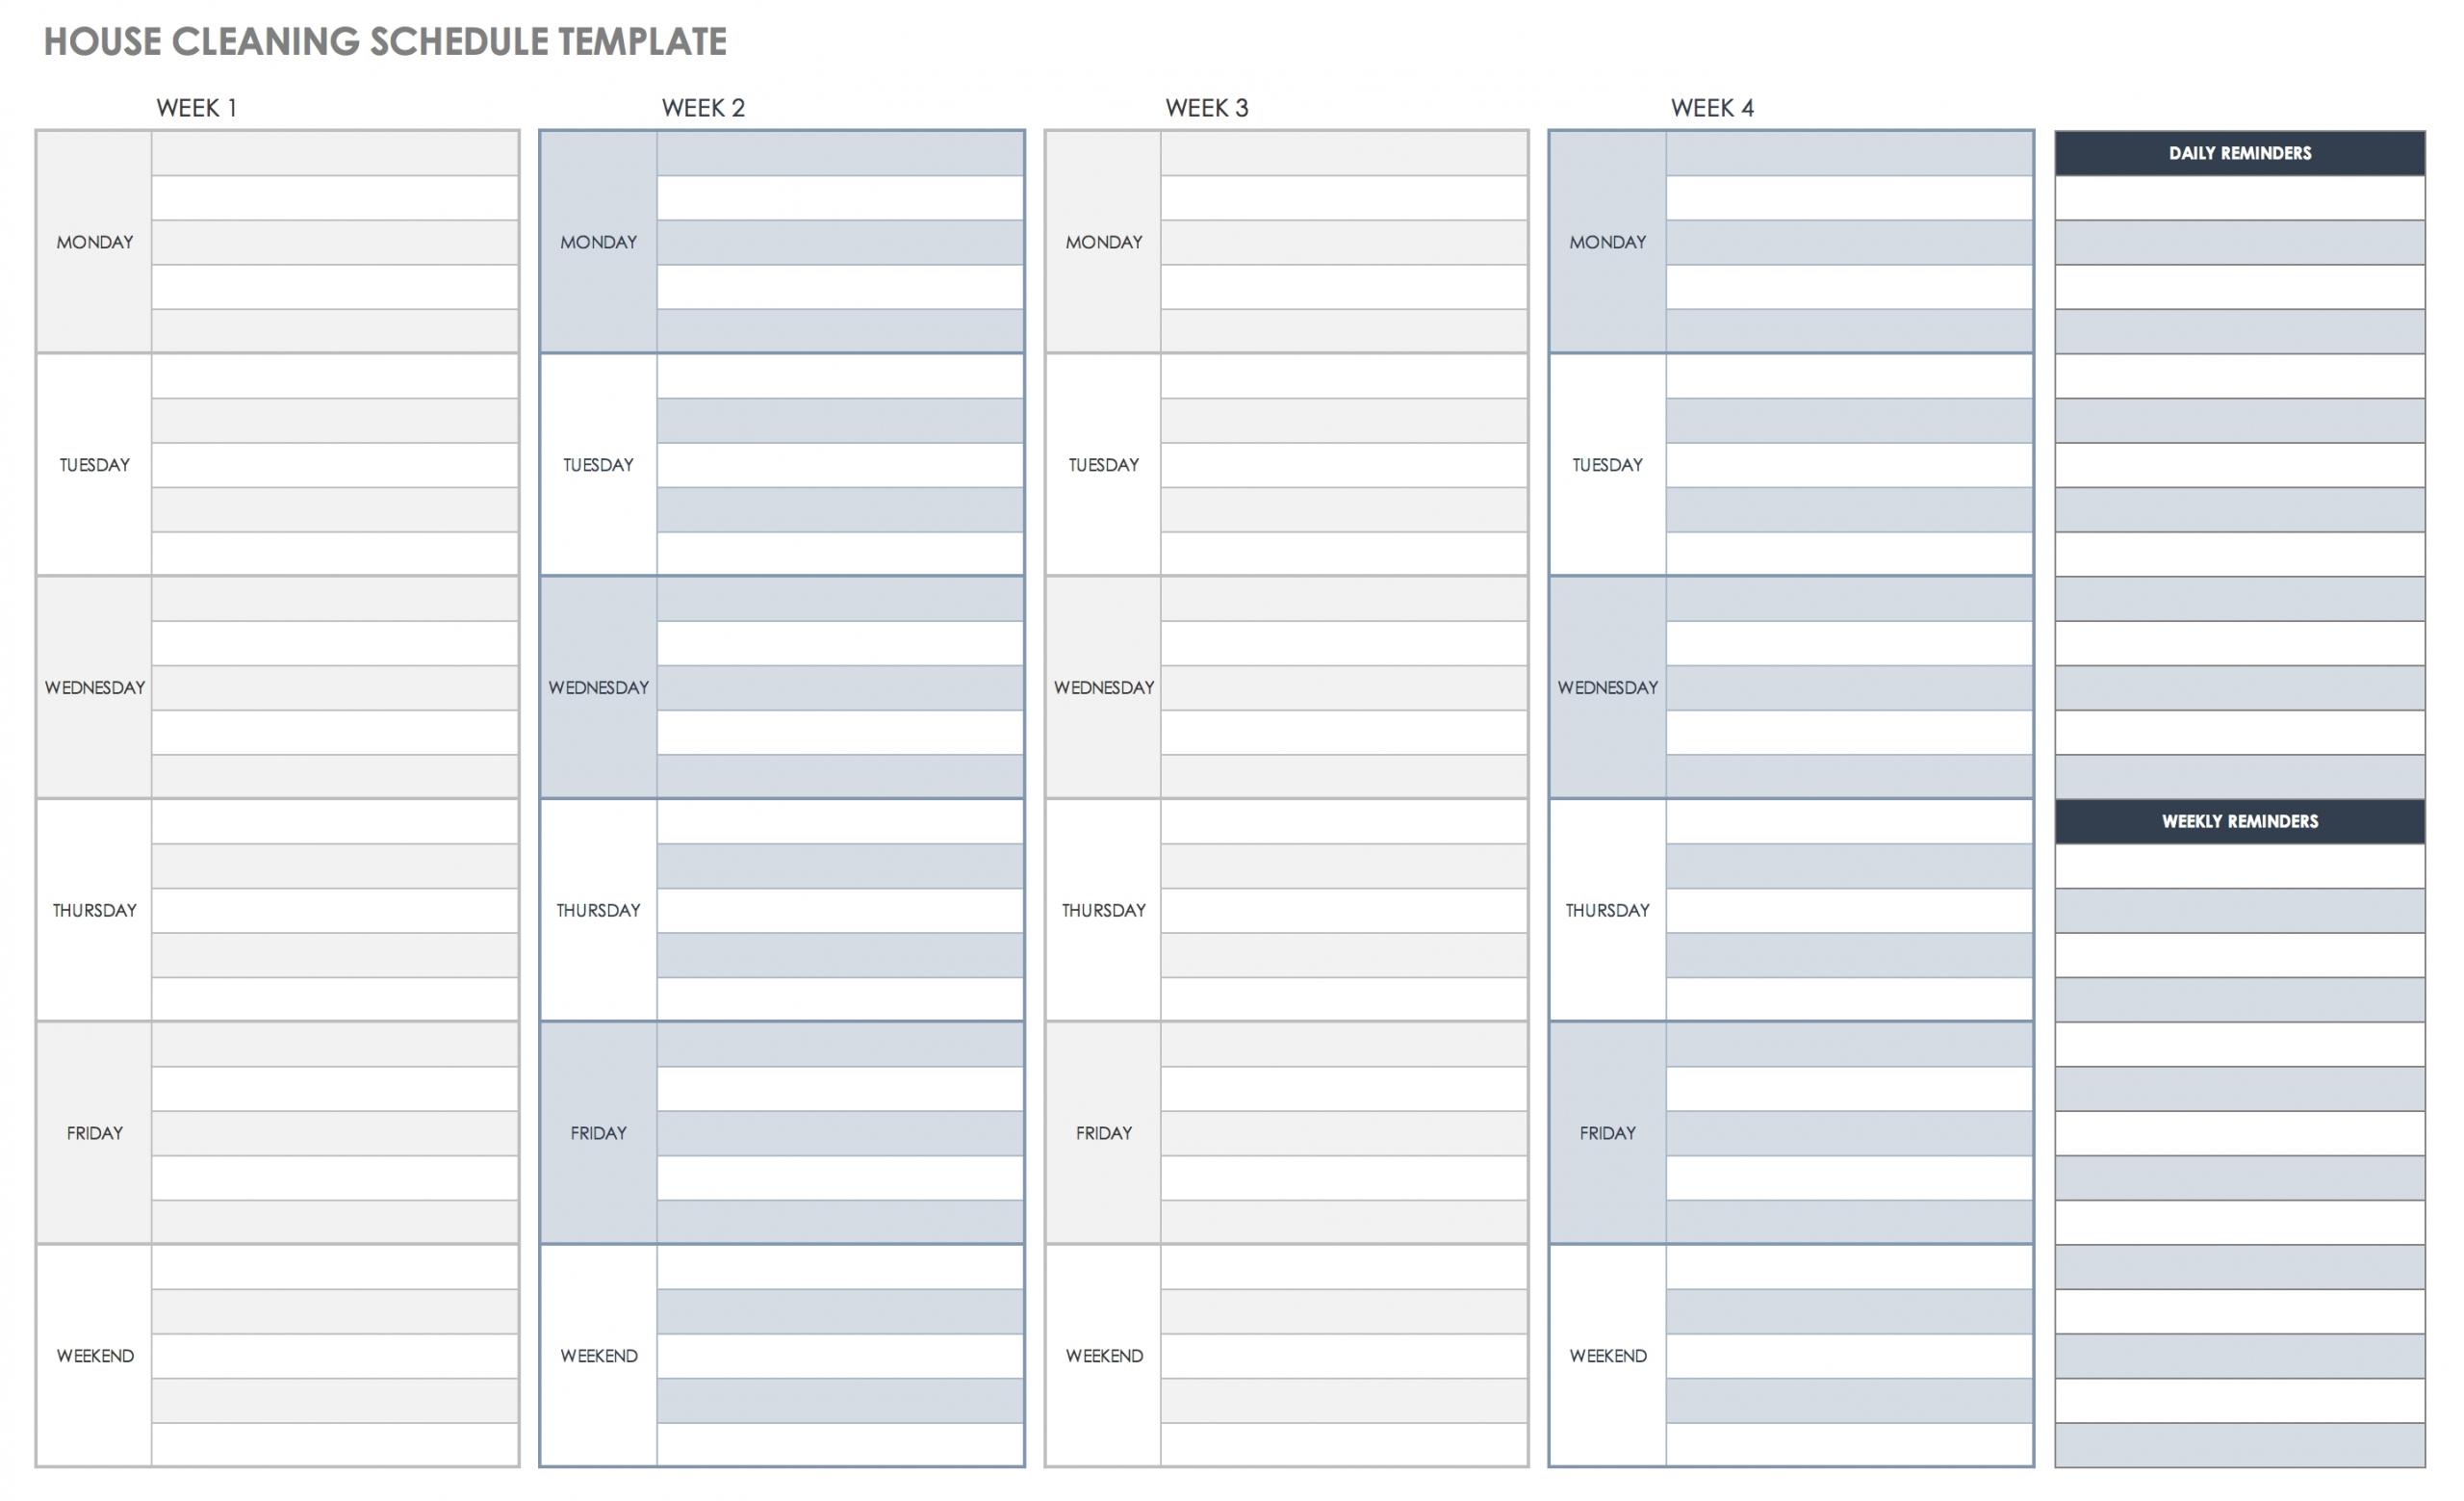 Catch Employee Daily Week Worksheet Template